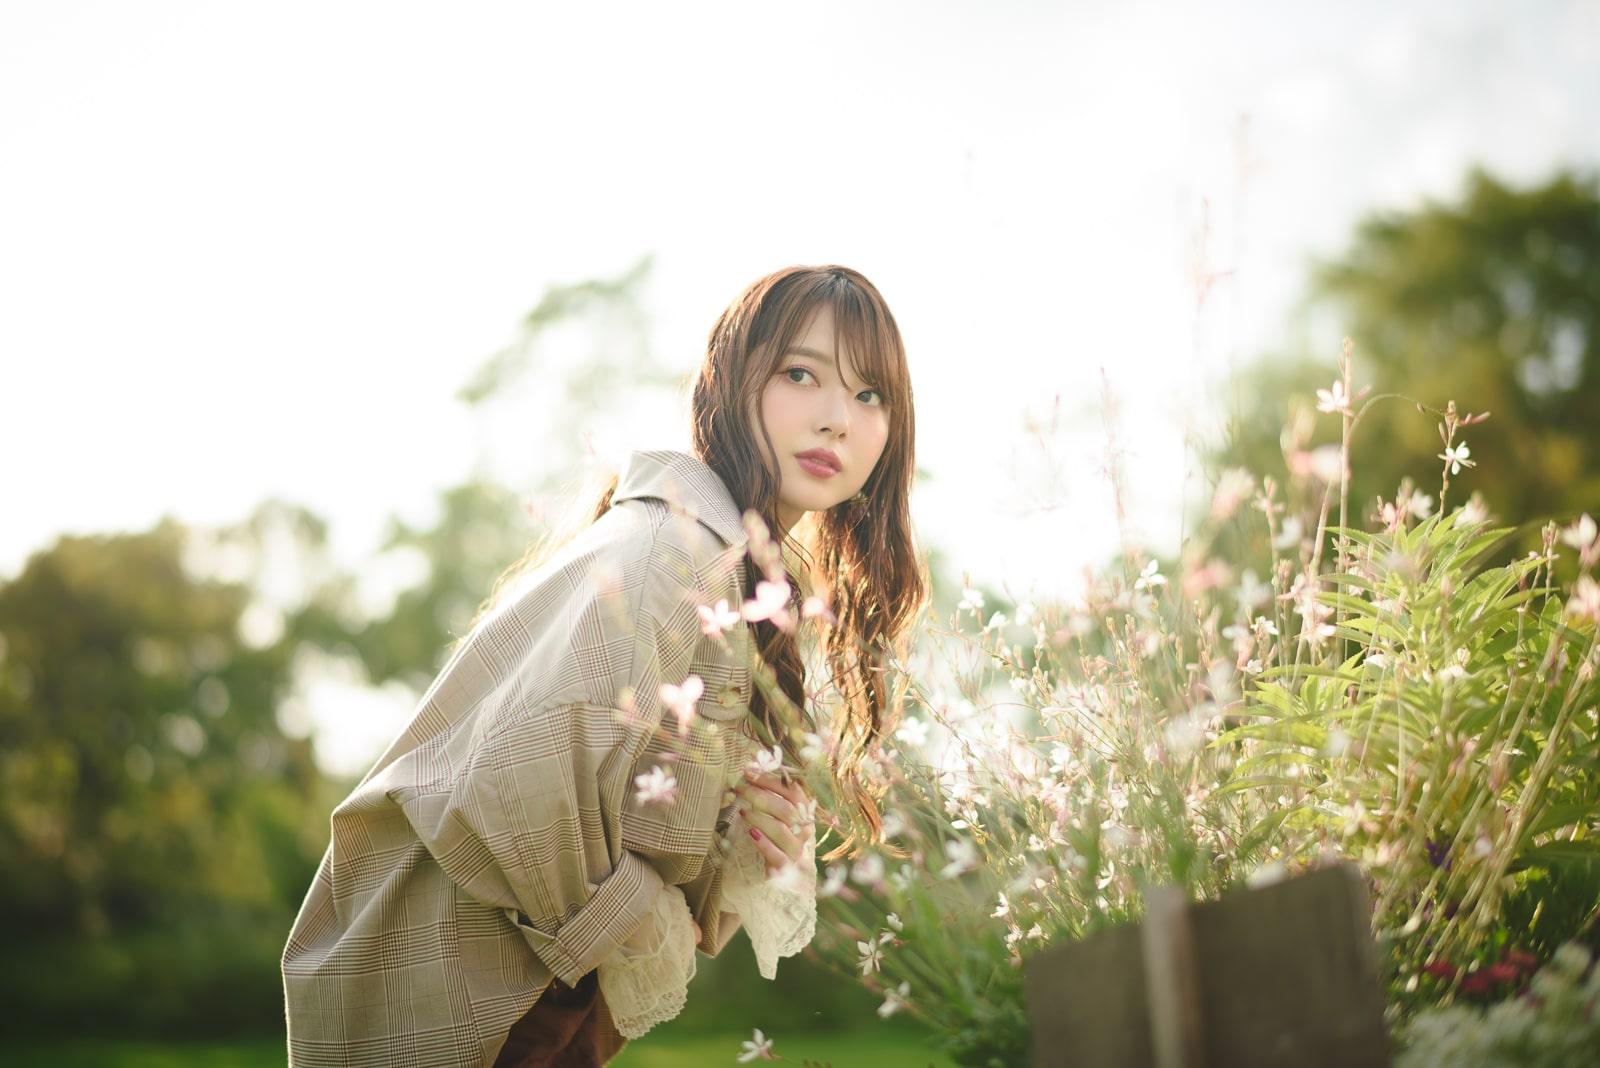 photo by hosoya